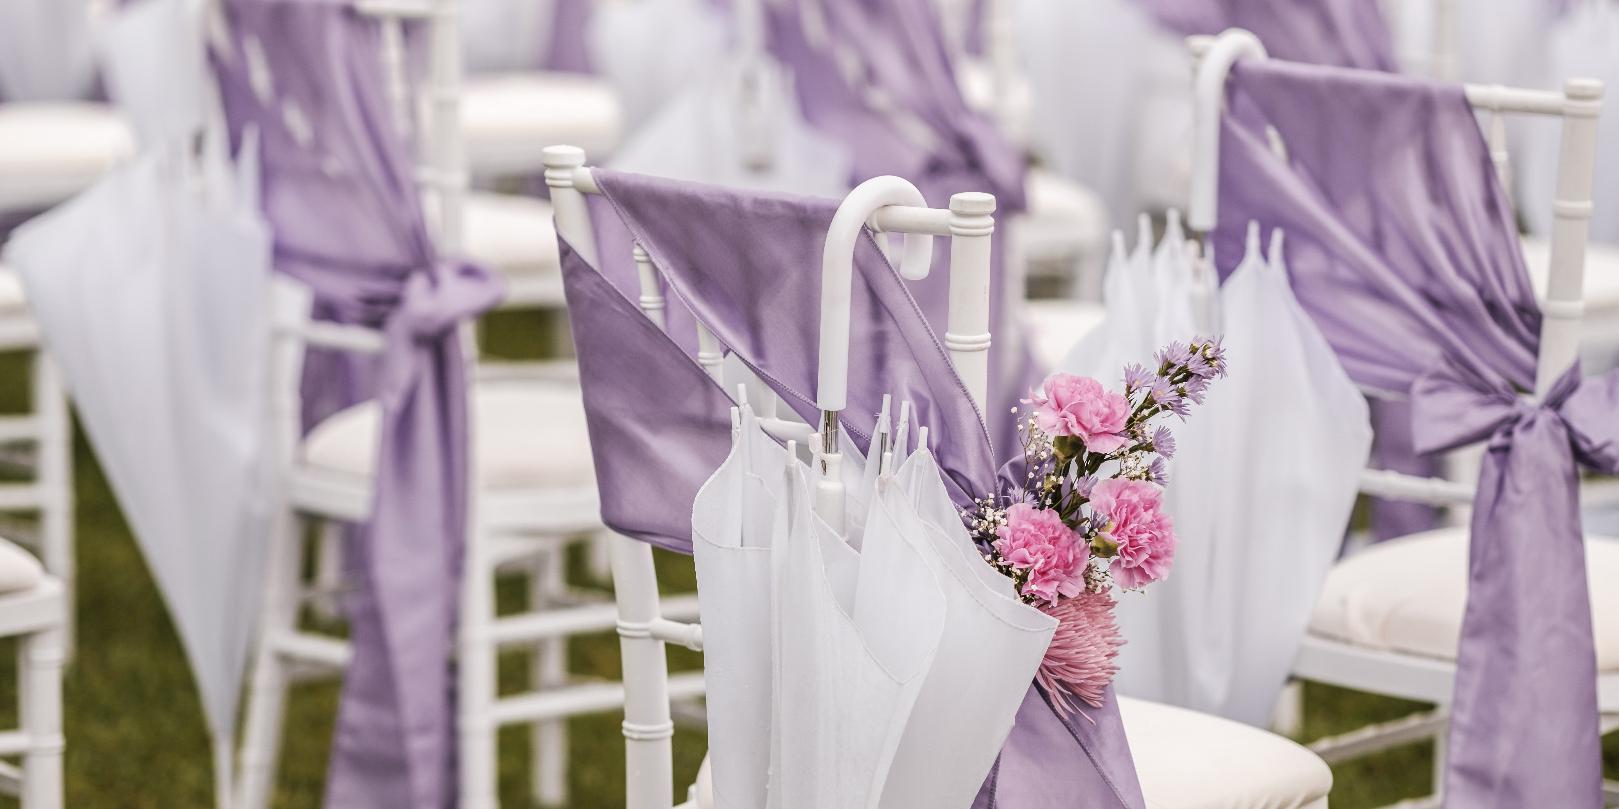 bodas-sin-clasificar-sin-tema-cuba-35521.jpg